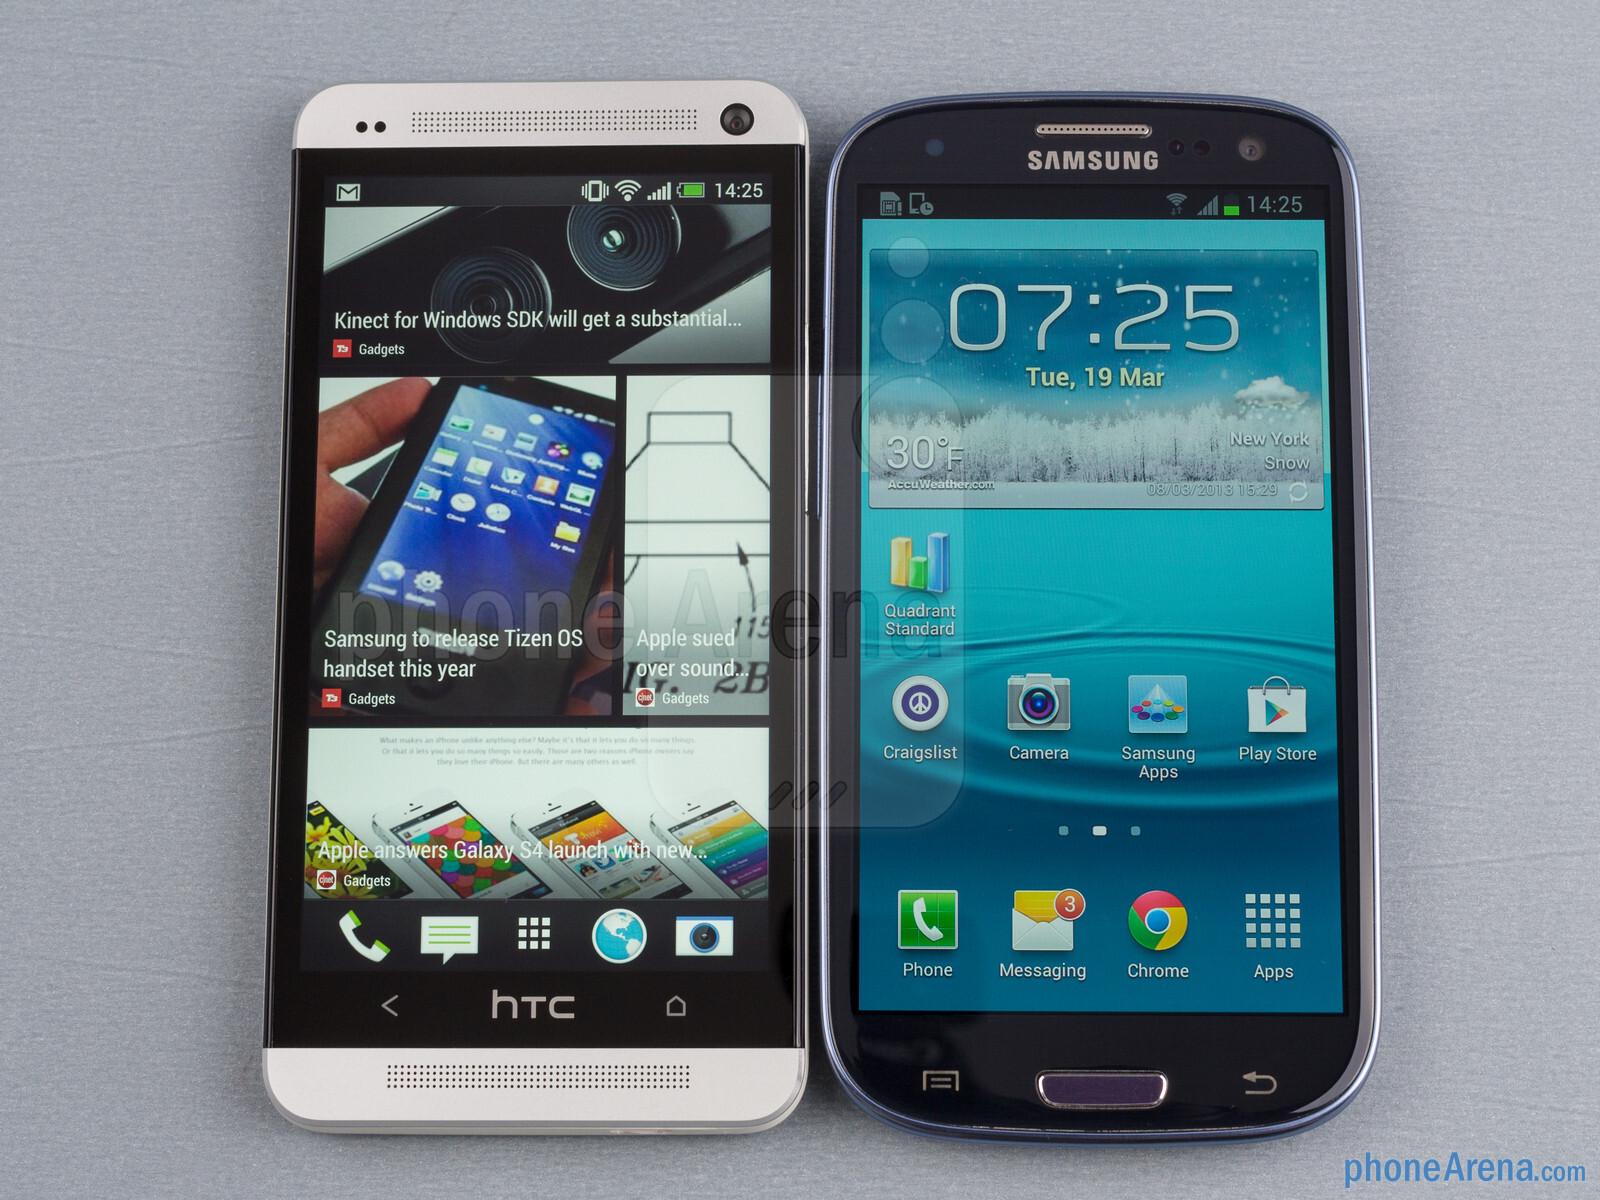 Amazon.com: Samsung Galaxy S3, Blue 16GB (Verizon Wireless): Cell ...